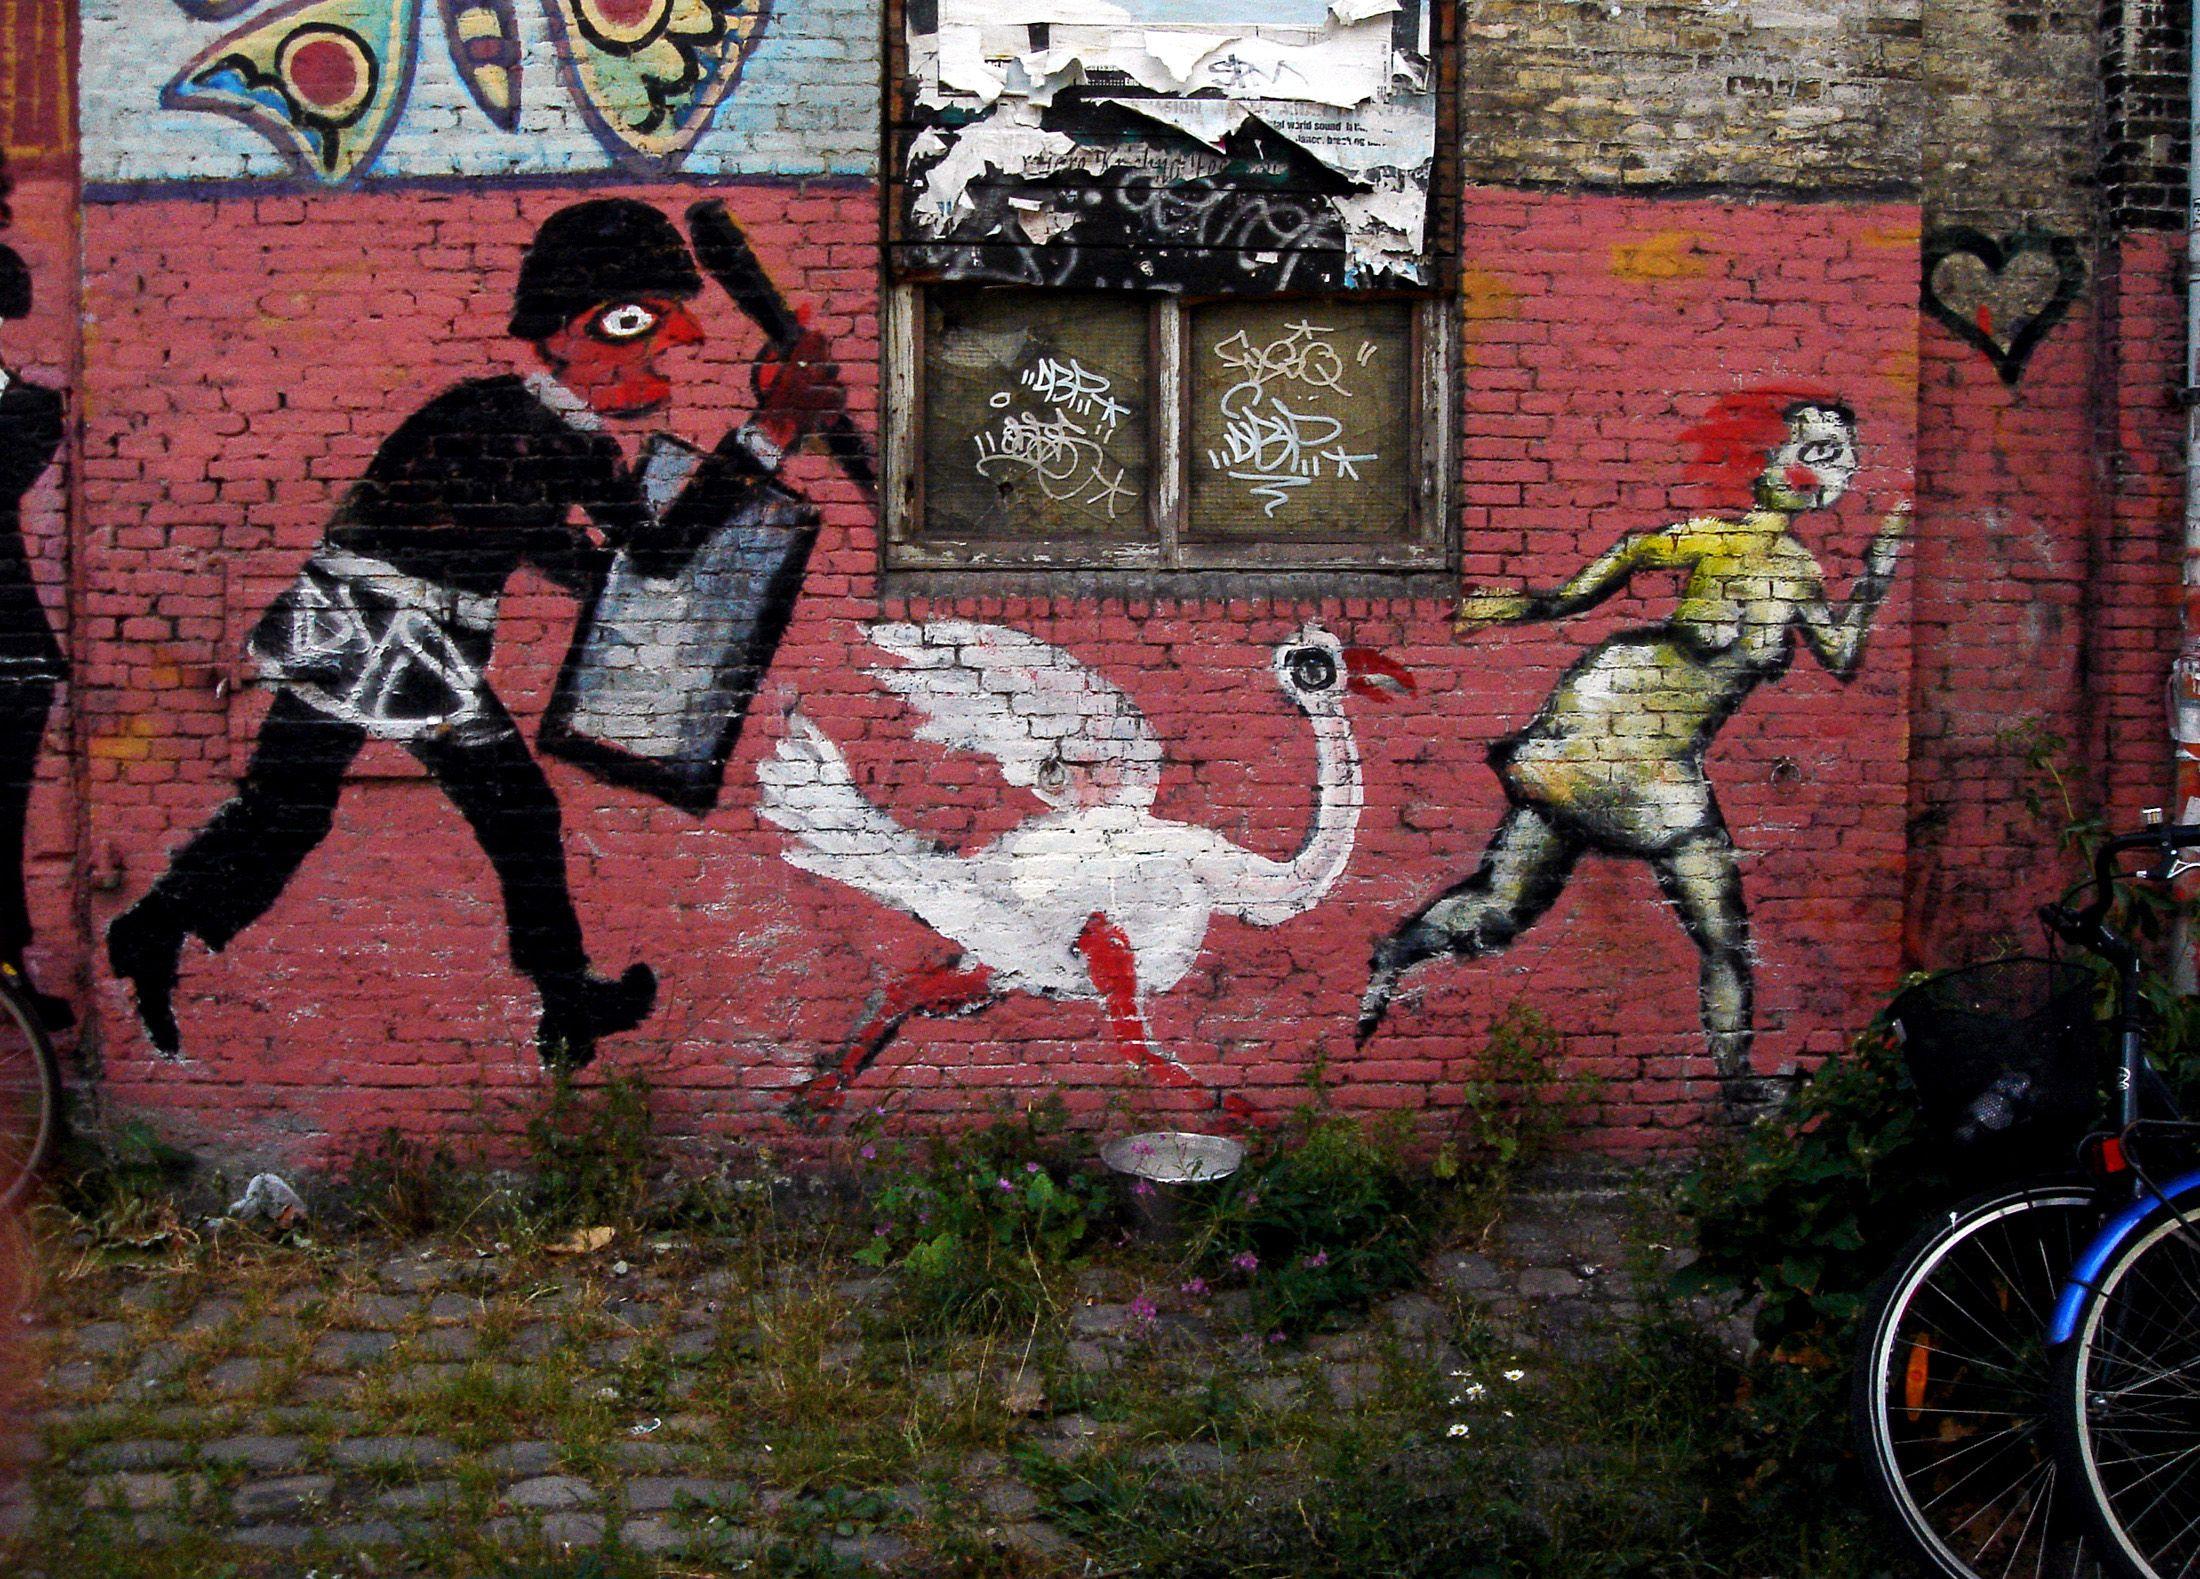 83 Jailed in Denmark's Biggest Ever Drugs Bust